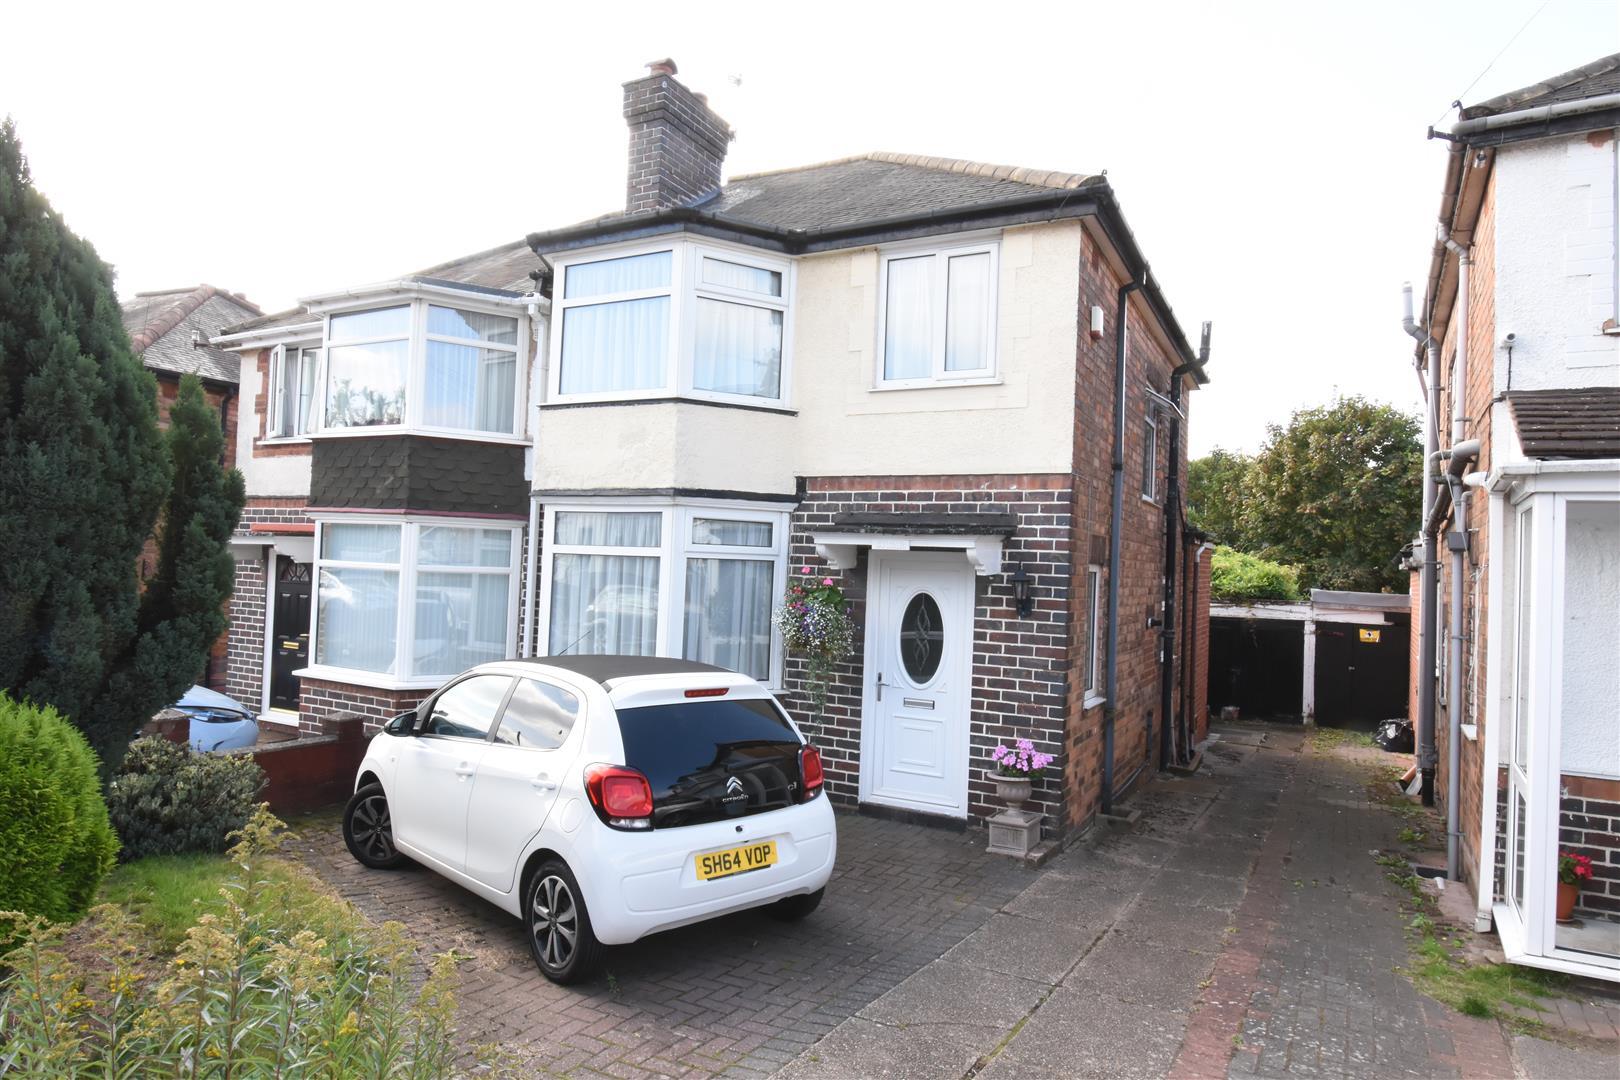 3 bed house for sale in Ermington Crescent, Birmingham, B36